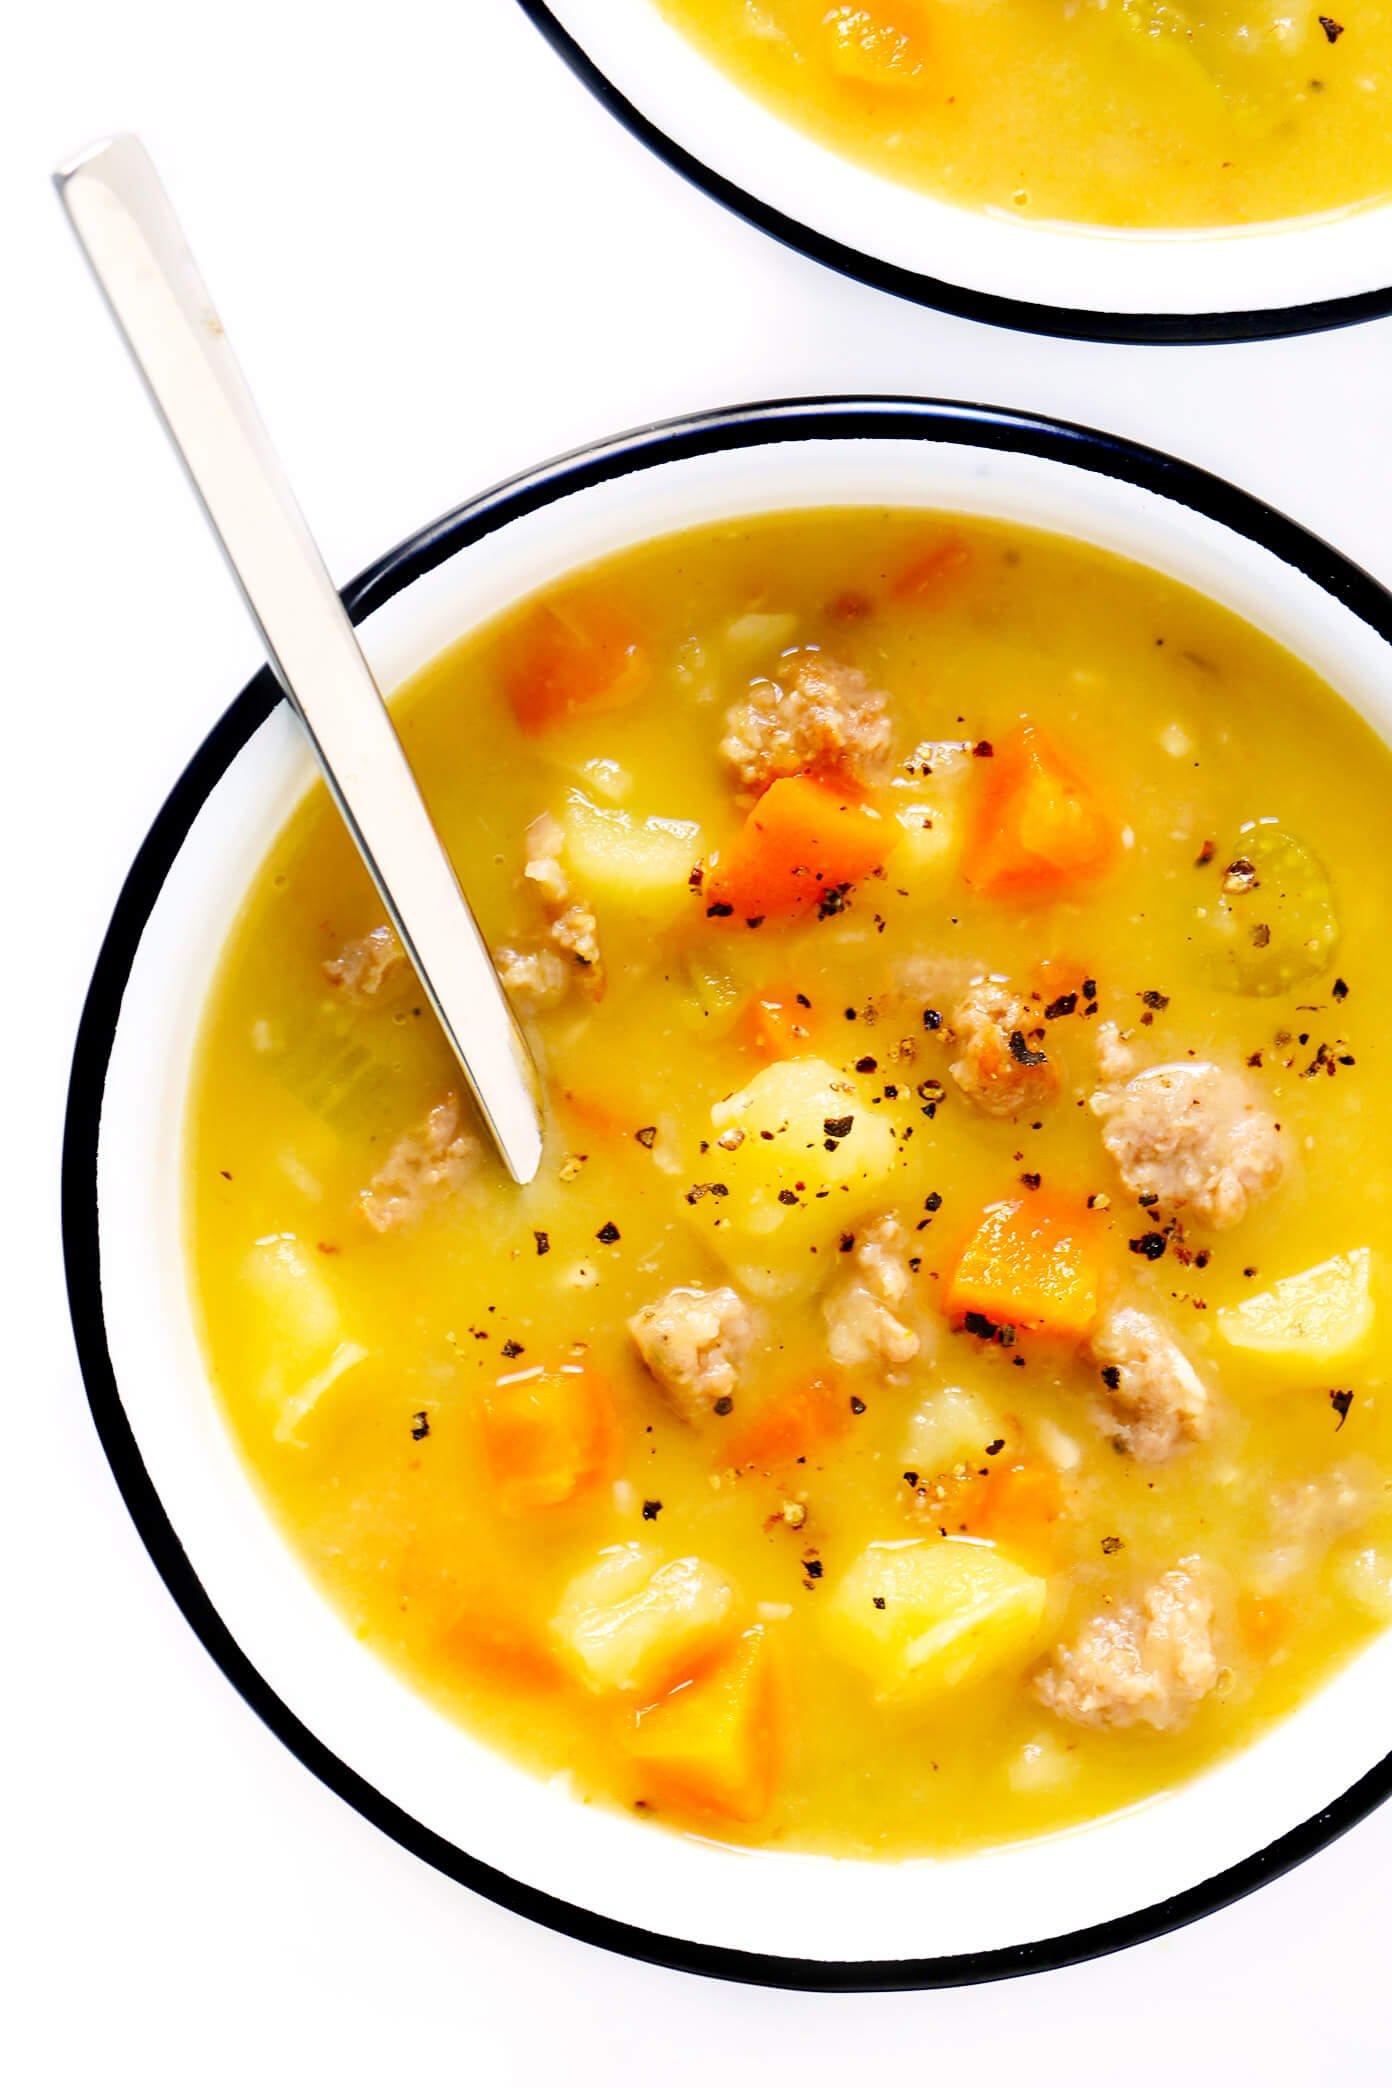 Turkey Cheeseburger Soup Recipe from Skinnytaste